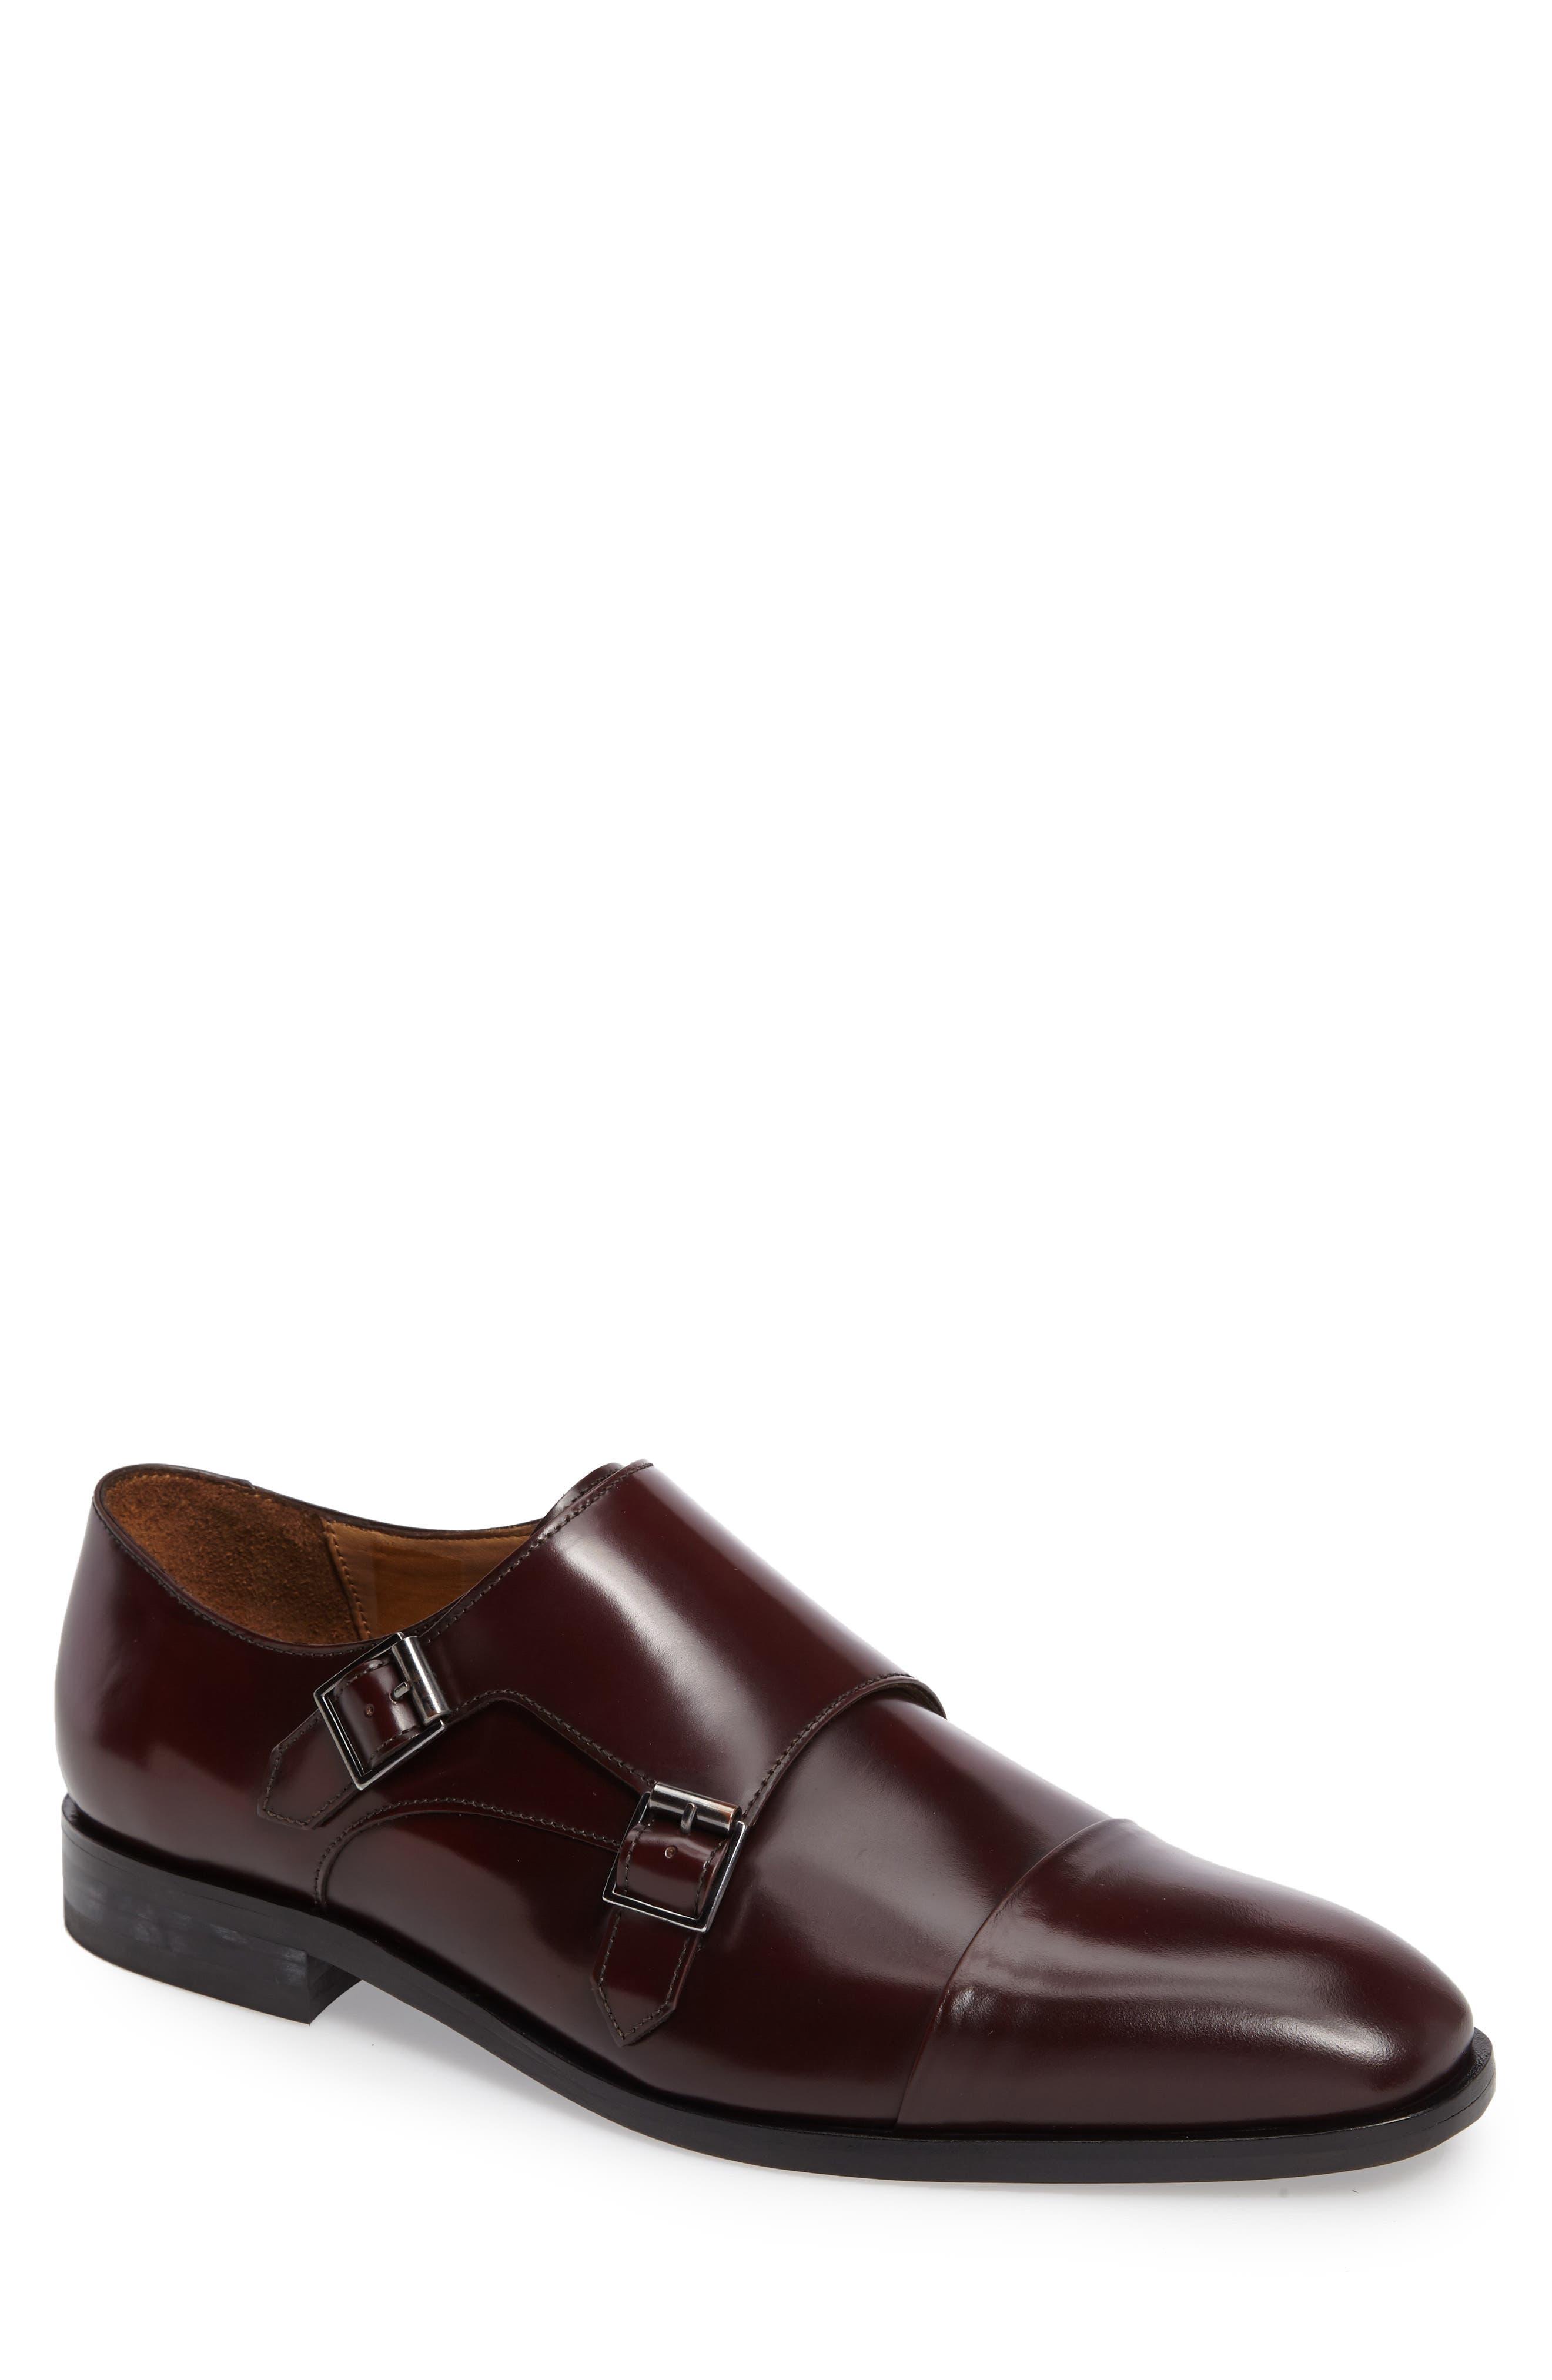 PAUL SMITH Luigi Double Monk Strap Shoe